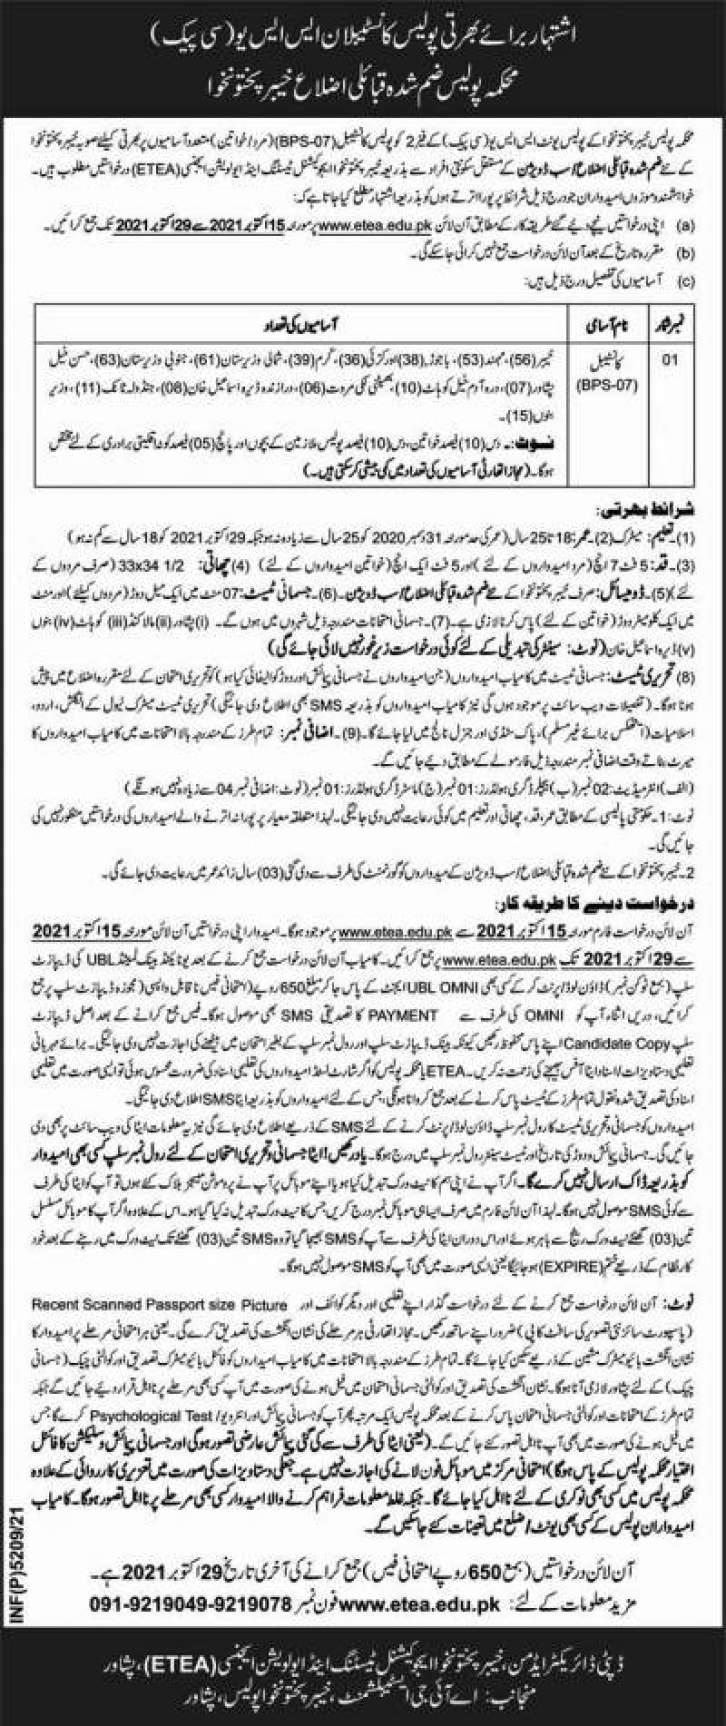 KPK Police Jobs 2021 SSU Constable CPEC-ETEA Application Form